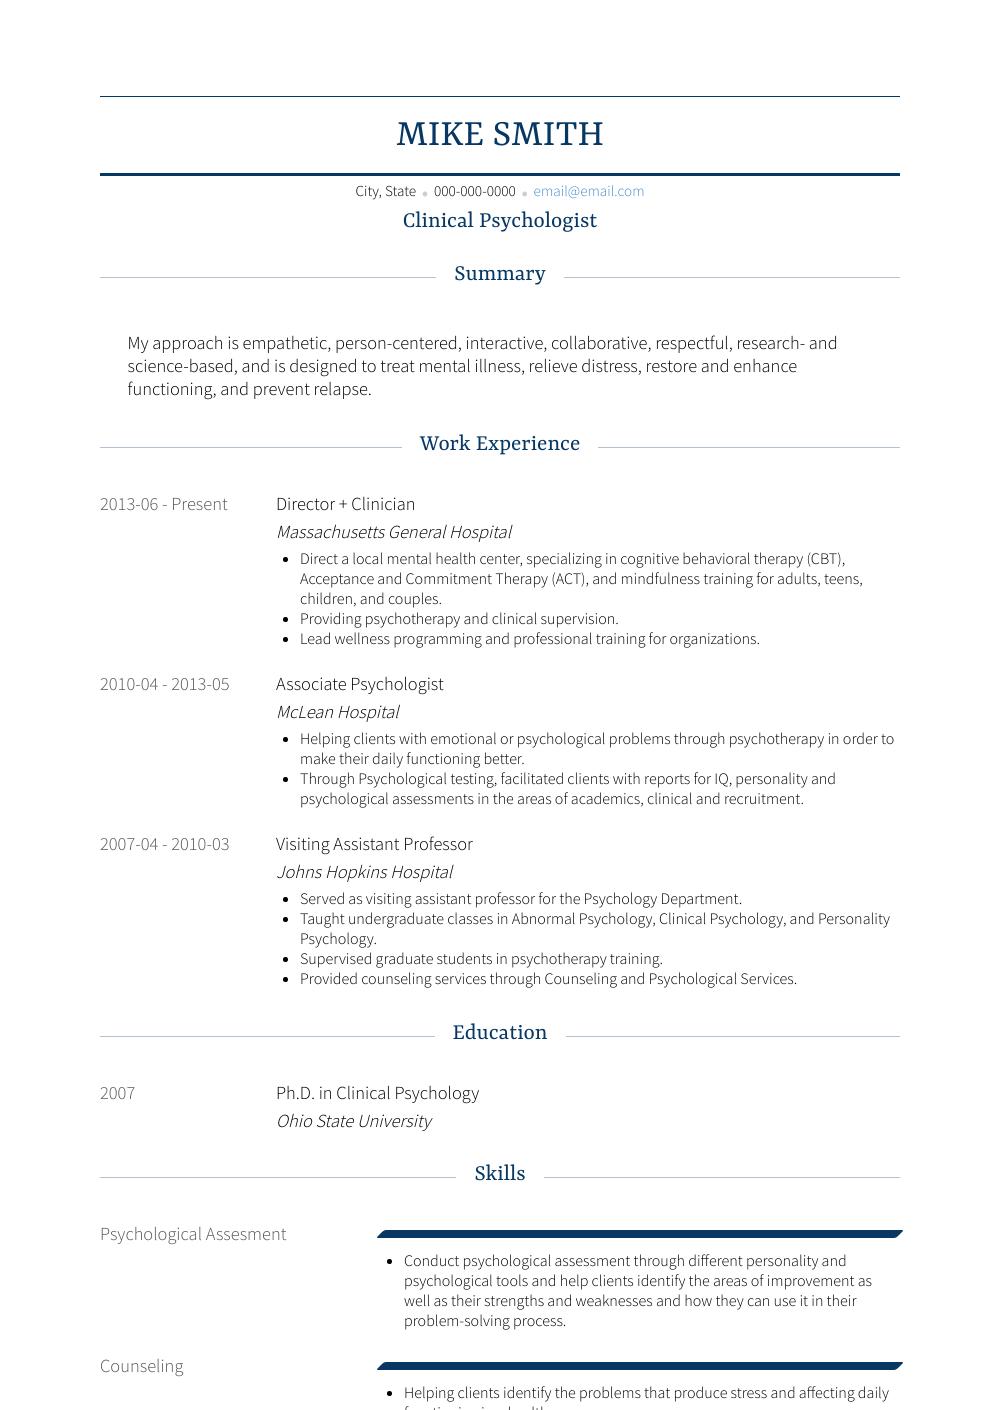 clinical psychologist resume sample